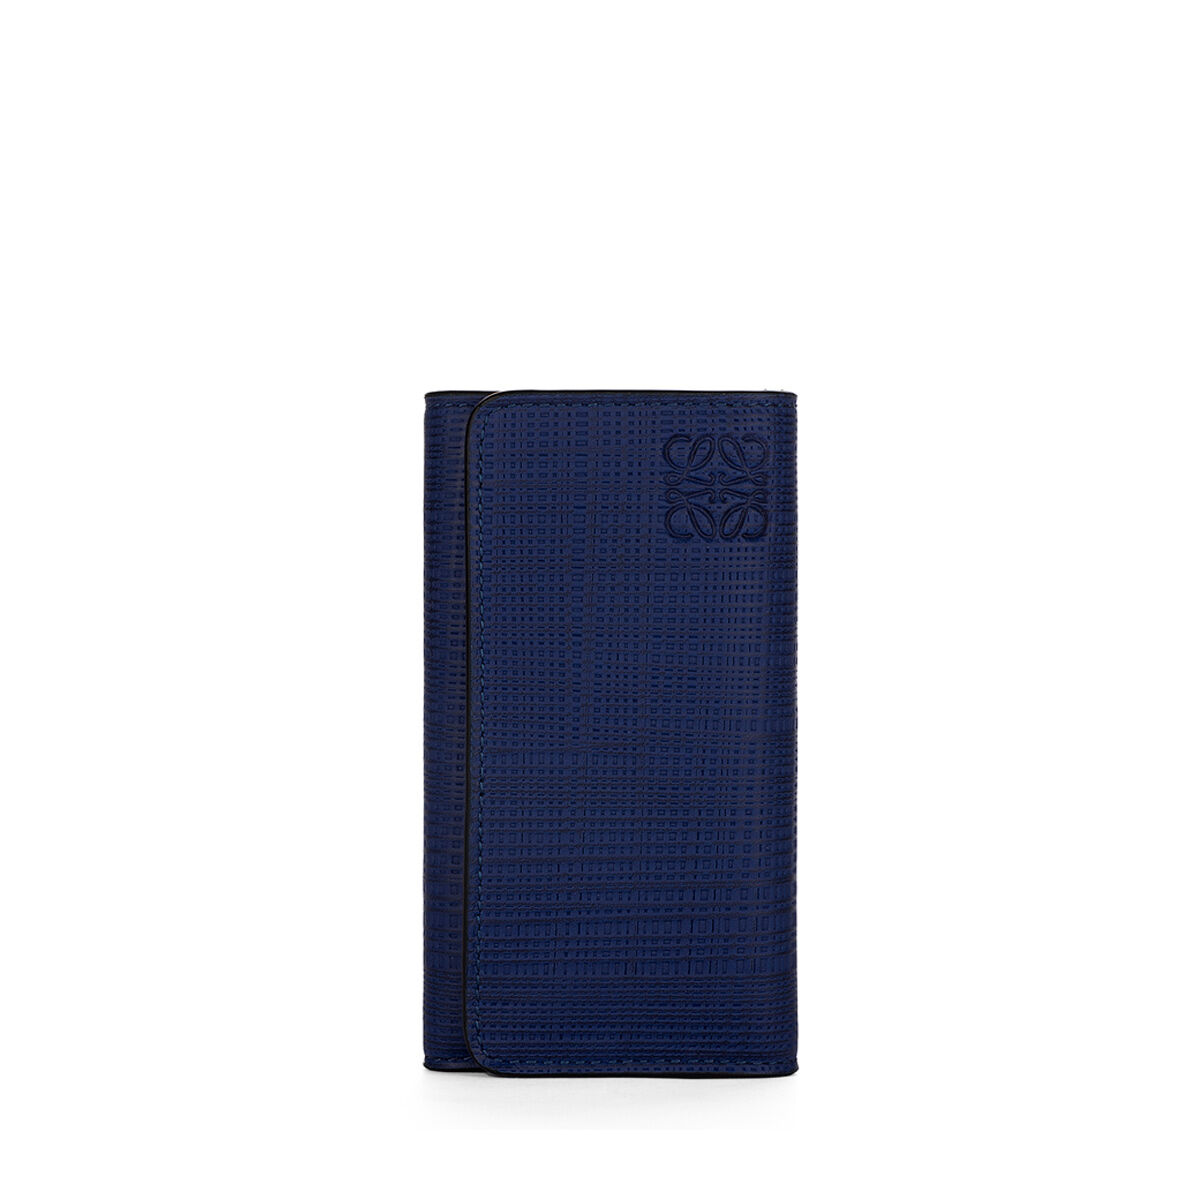 LOEWE 6 Keys Keyring Navy Blue all